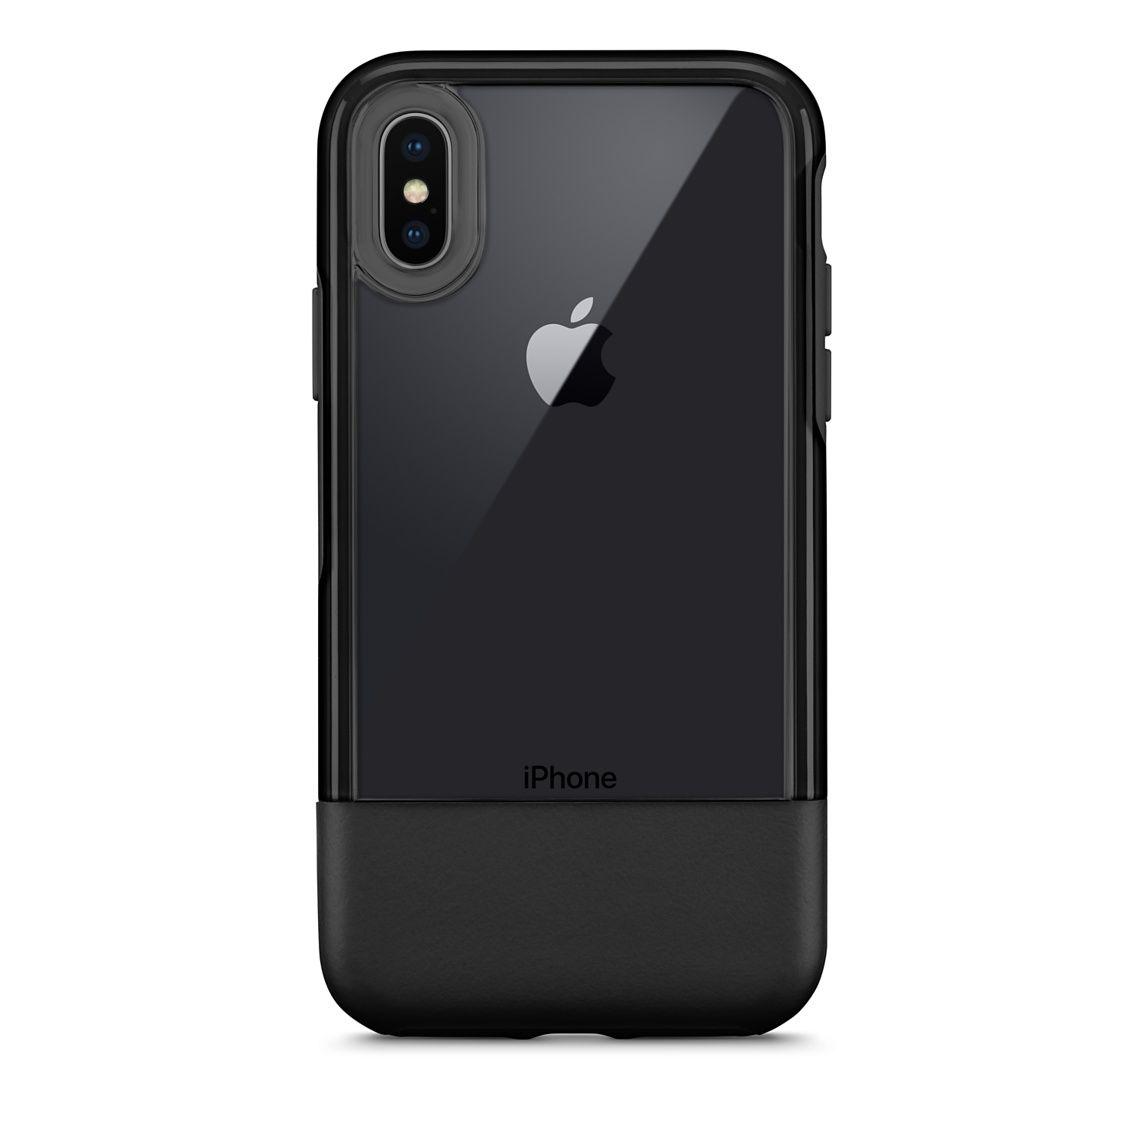 iphone 8 workman case